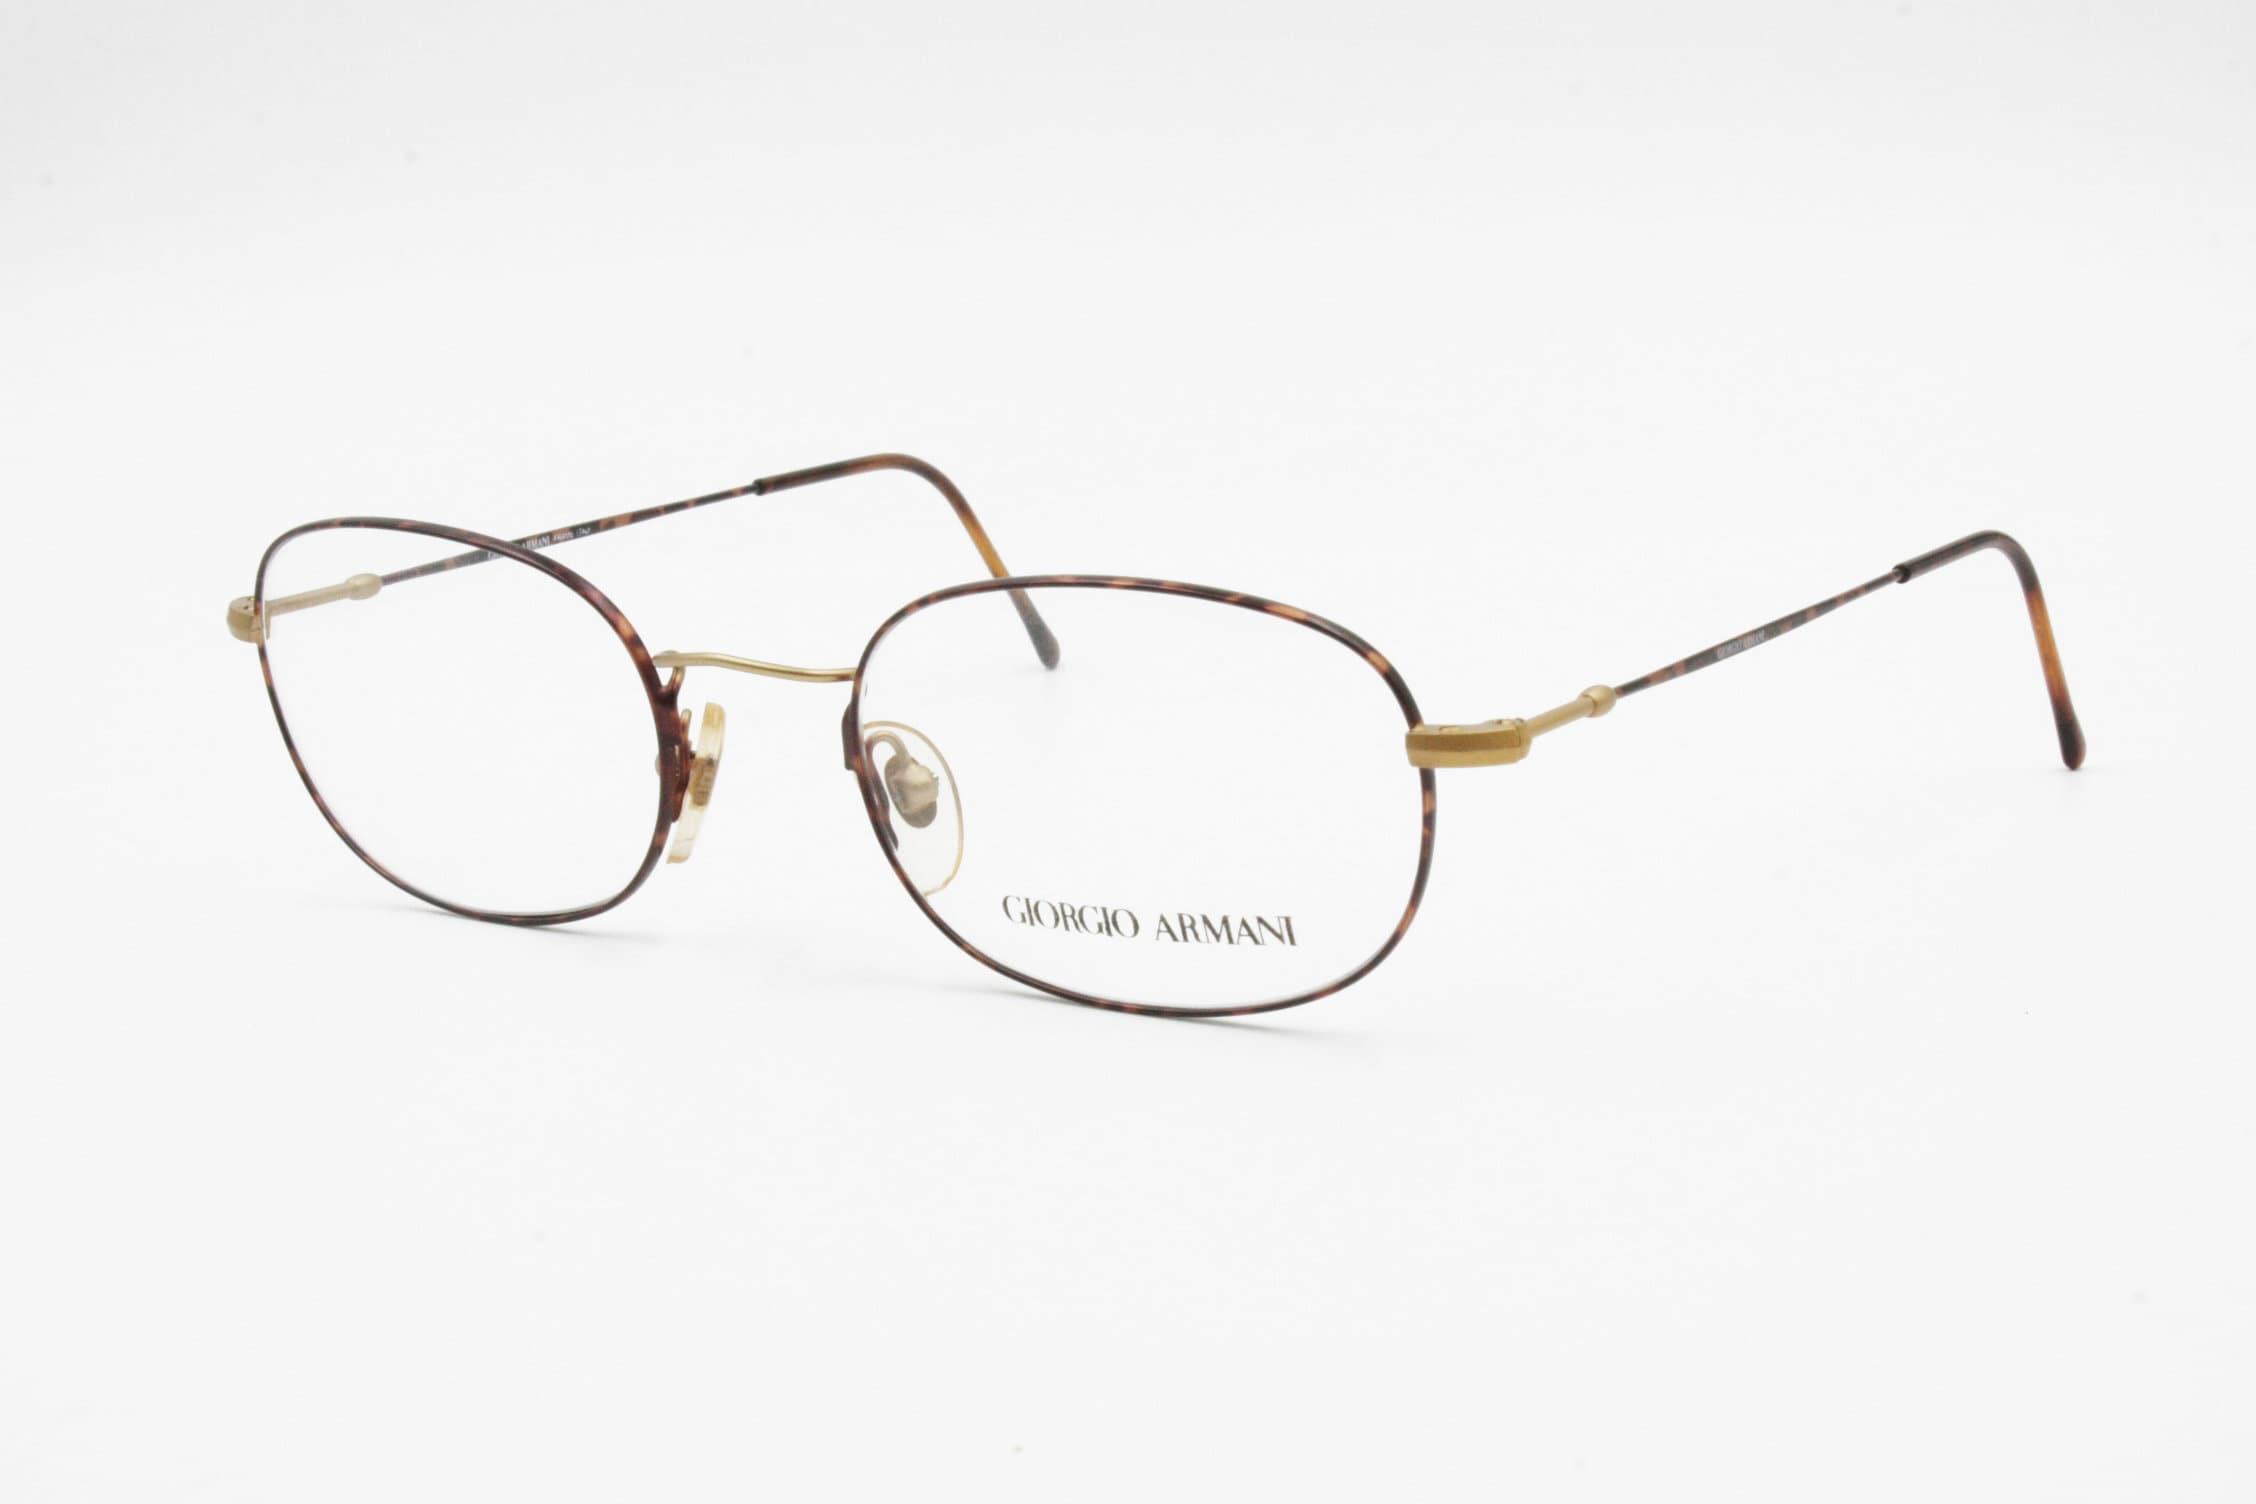 785a54f292d Giorgio Armani Vintage eyeglasses frame slim metal animalier